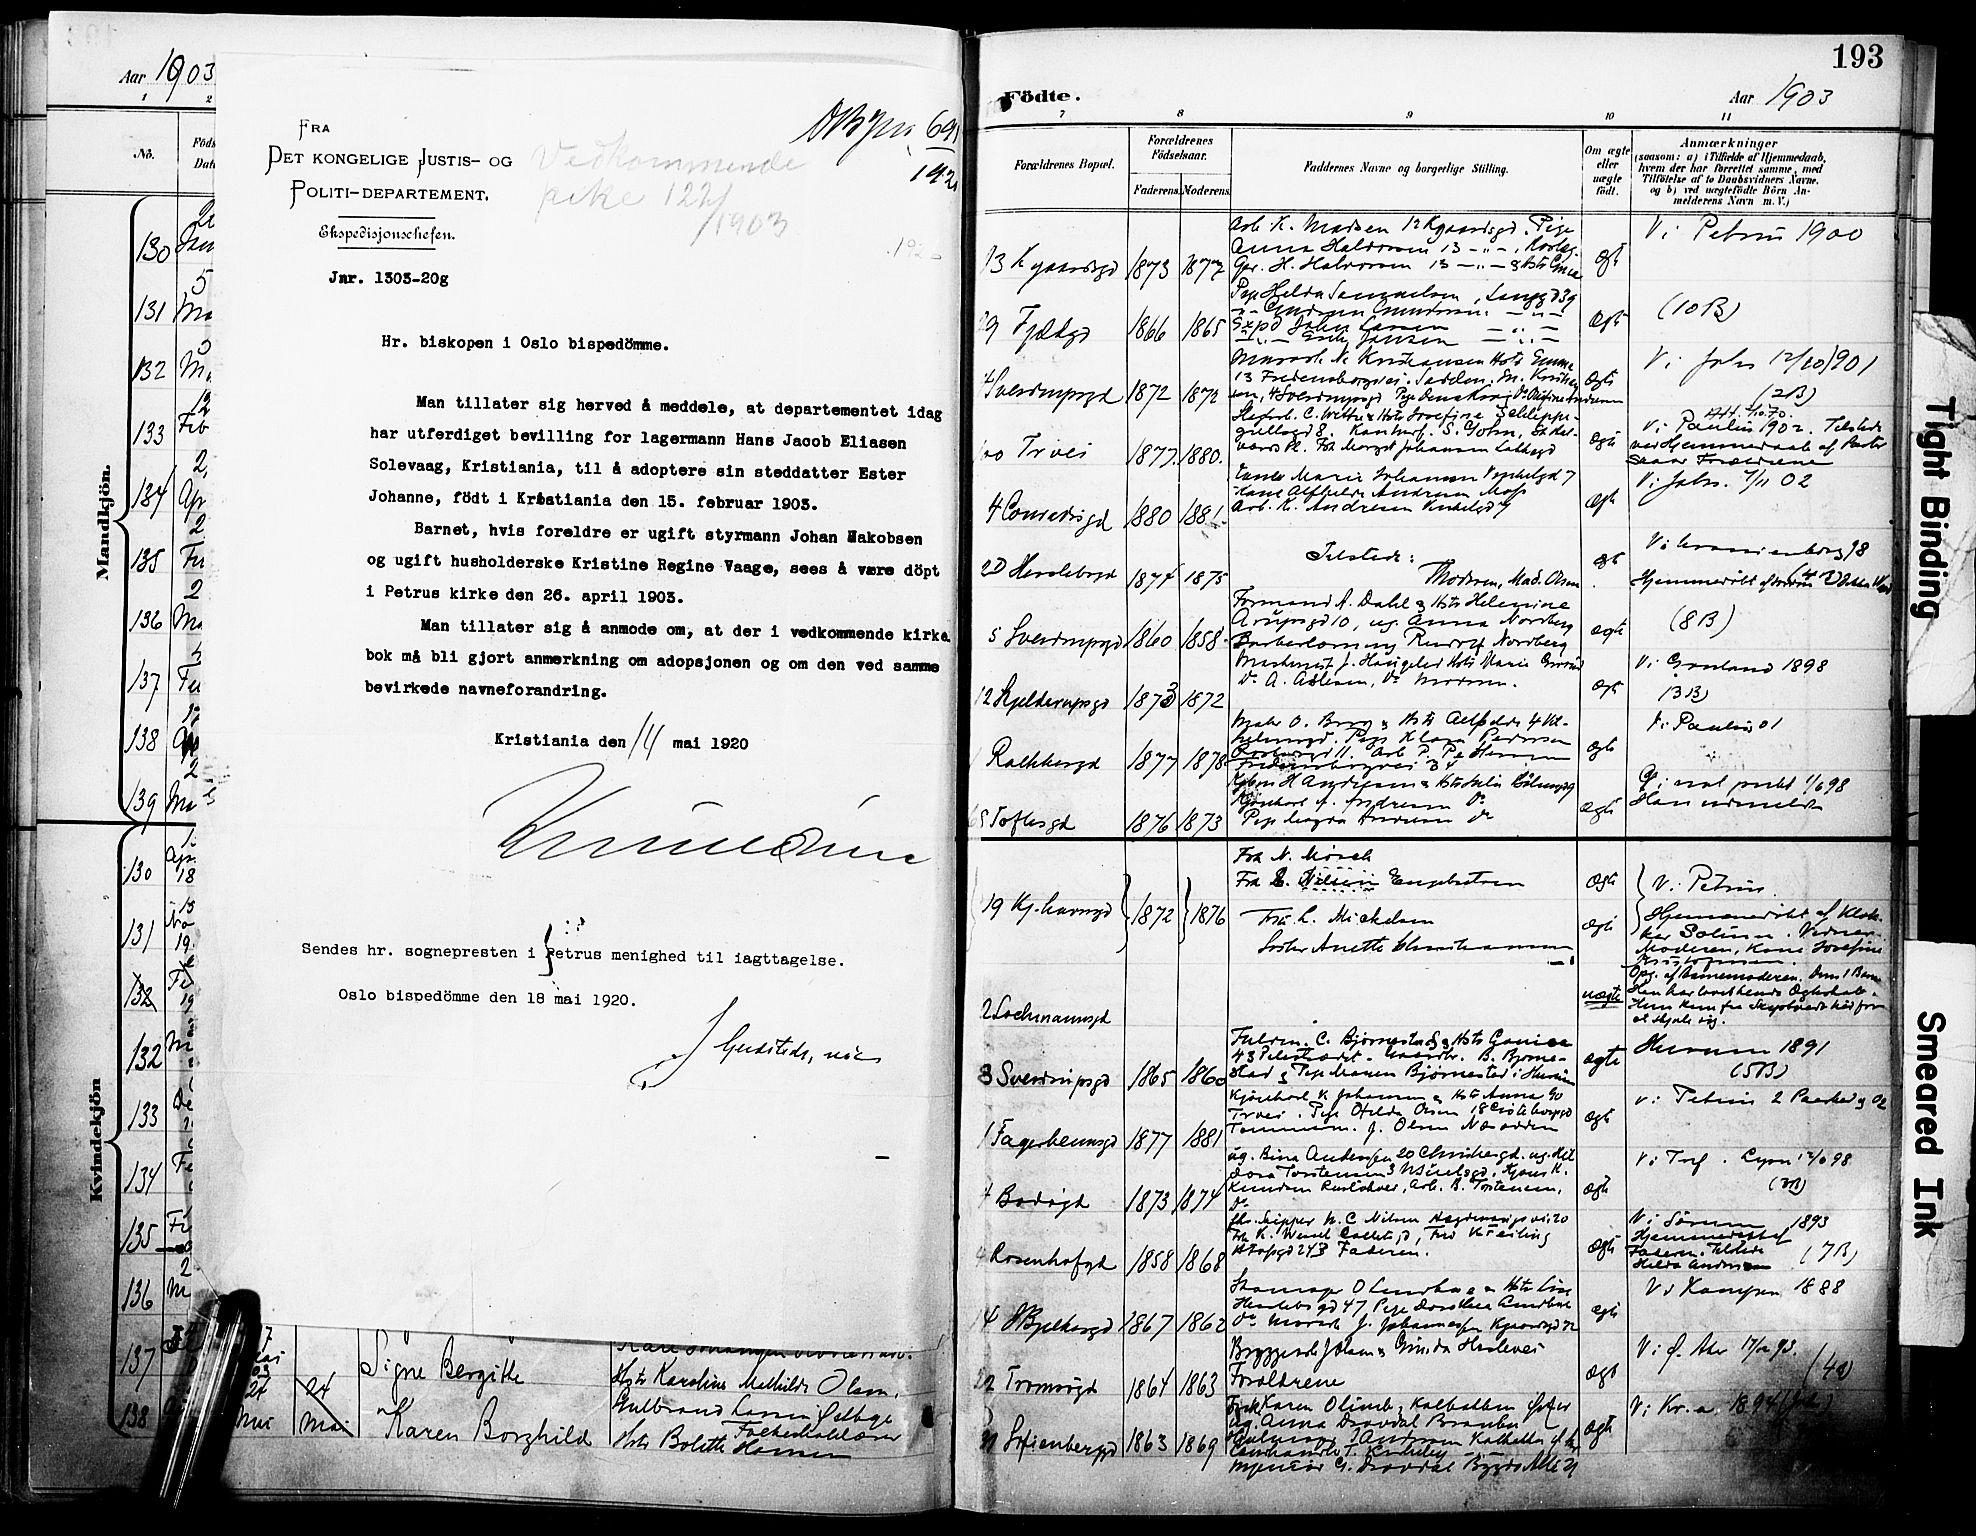 SAO, Petrus prestekontor Kirkebøker, F/Fa/L0005: Ministerialbok nr. 5, 1899-1903